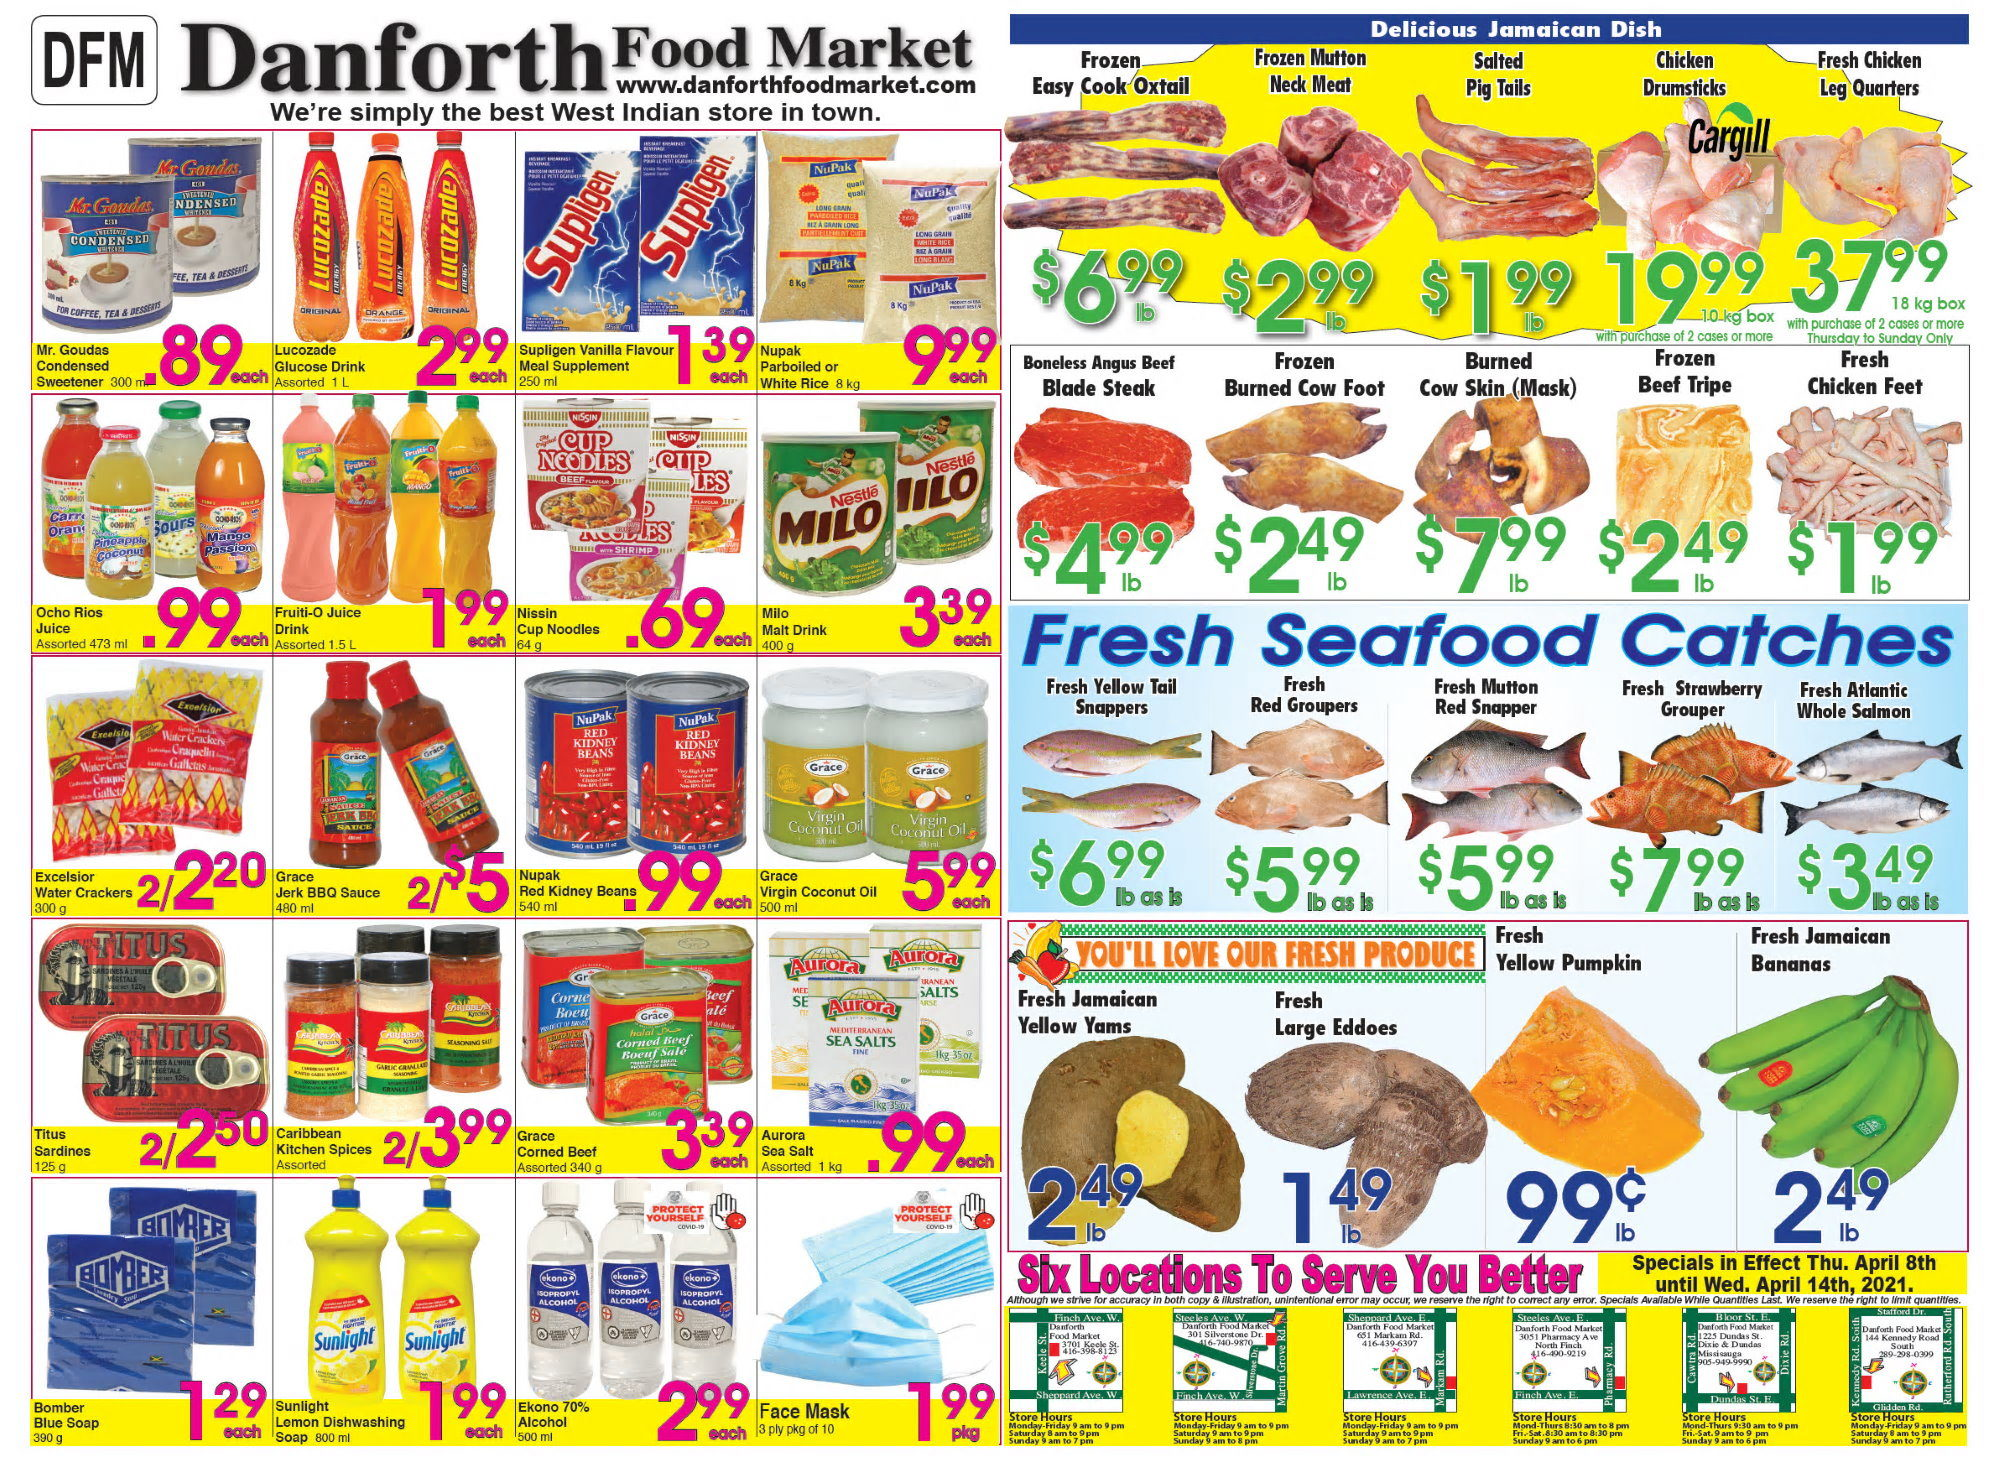 Danforth Food Market - Weekly Flyer Specials